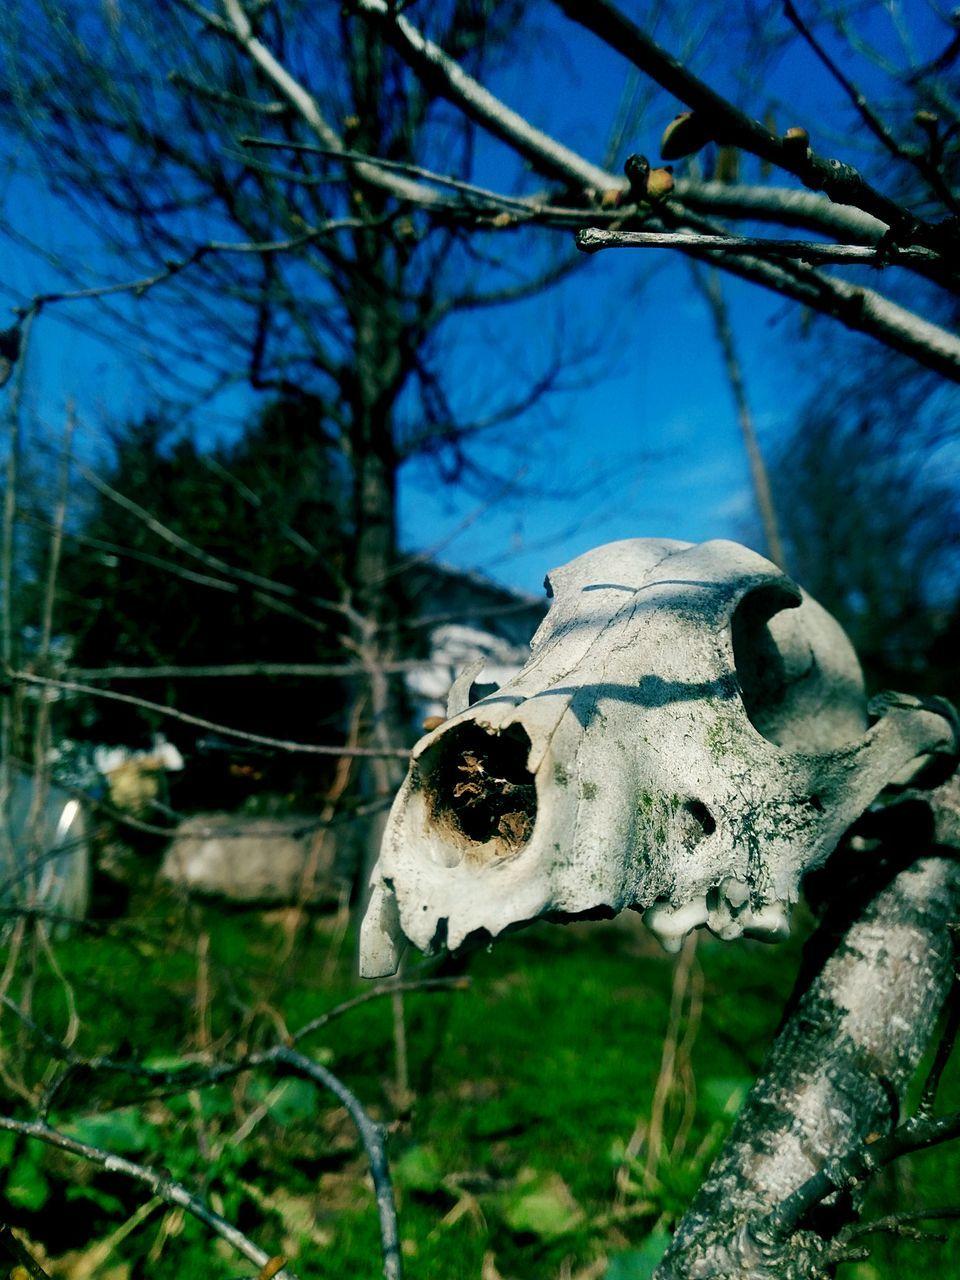 animal skull, animal bone, animal themes, bone, close-up, no people, one animal, day, focus on foreground, skeleton, outdoors, tree, nature